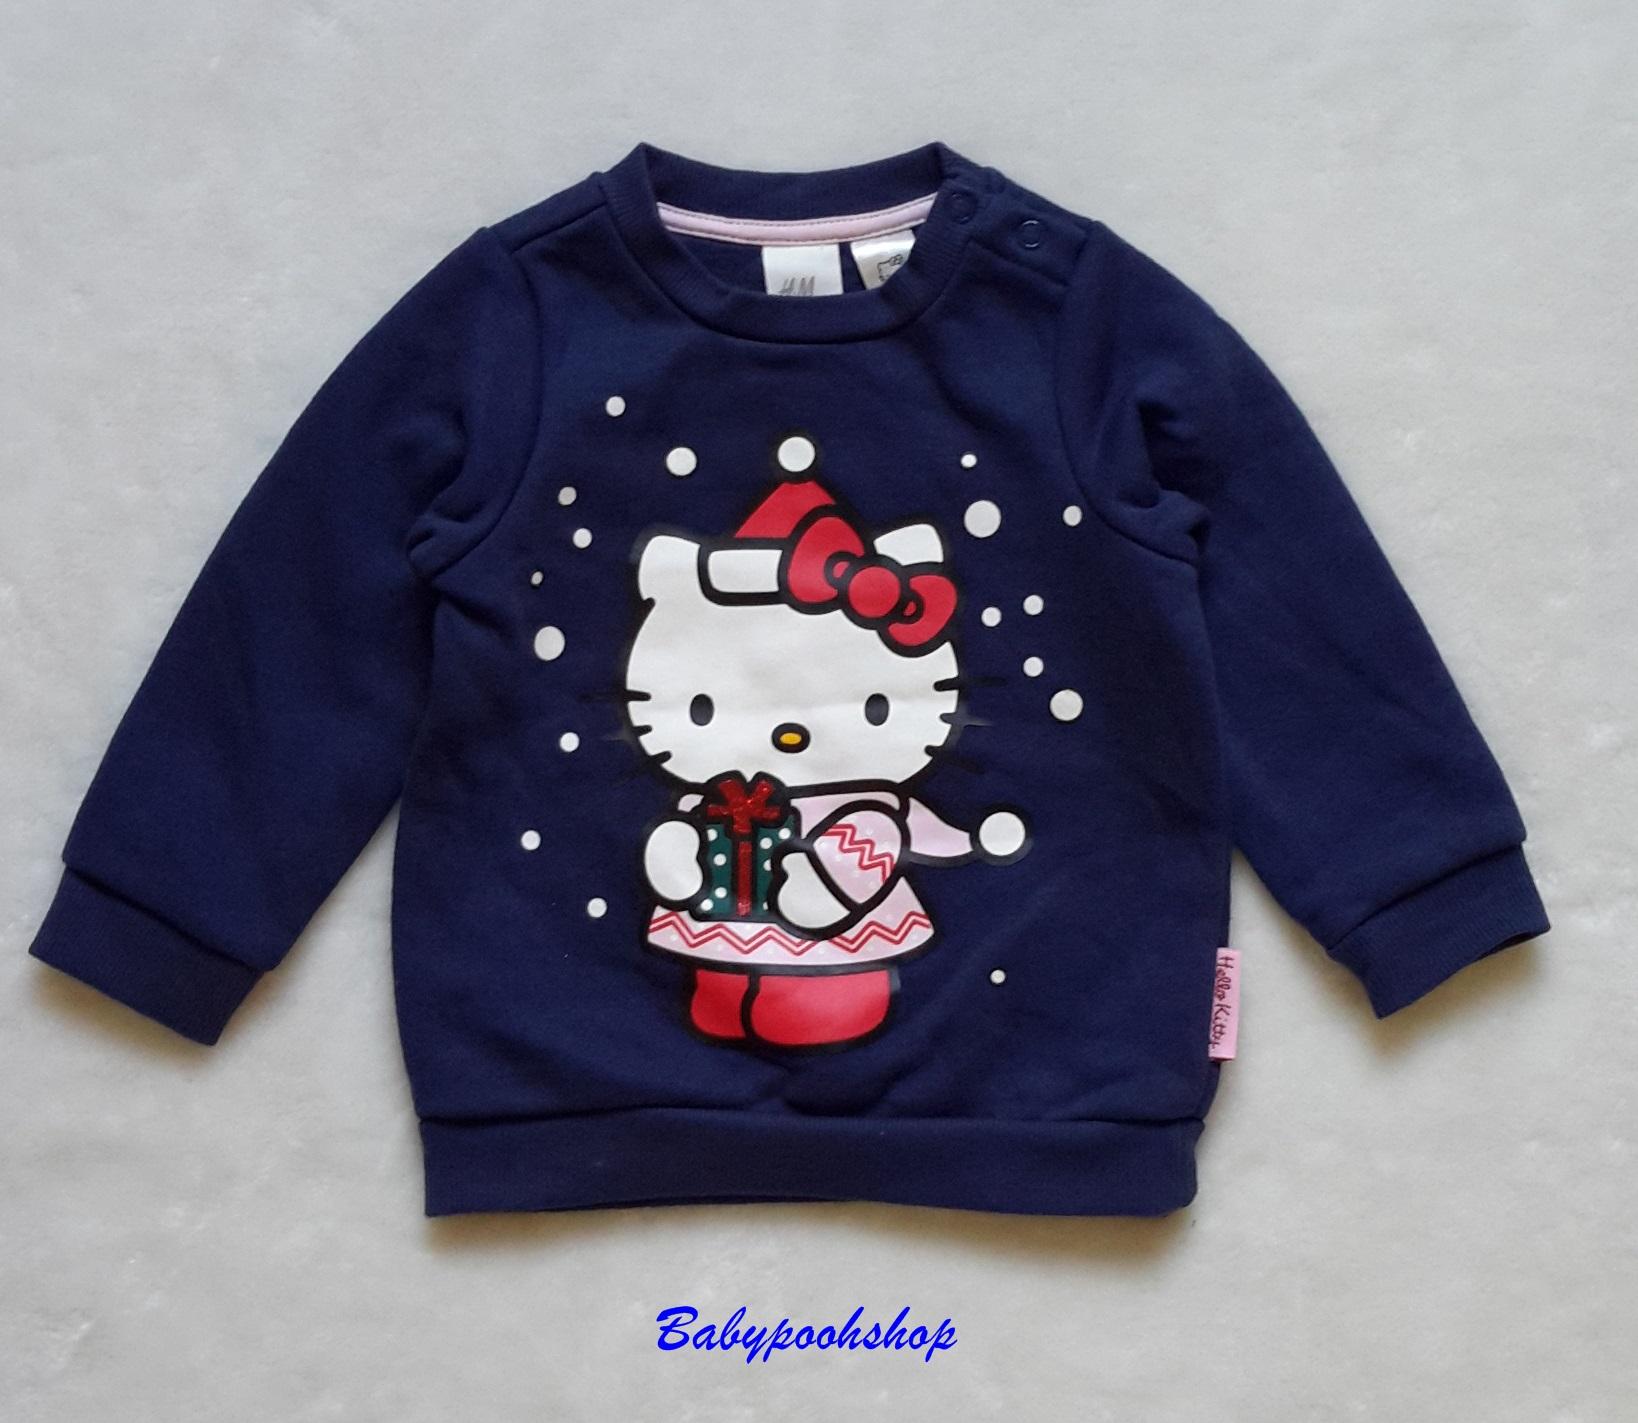 H&M : เสื้อแขนยาว กันหนาว Heloo Kitty สีกรม ข้างในบุผ้าสำลี มีกระดุมที่บ่า size : 4-6m / 6-9m / 9-12m / 12-18m